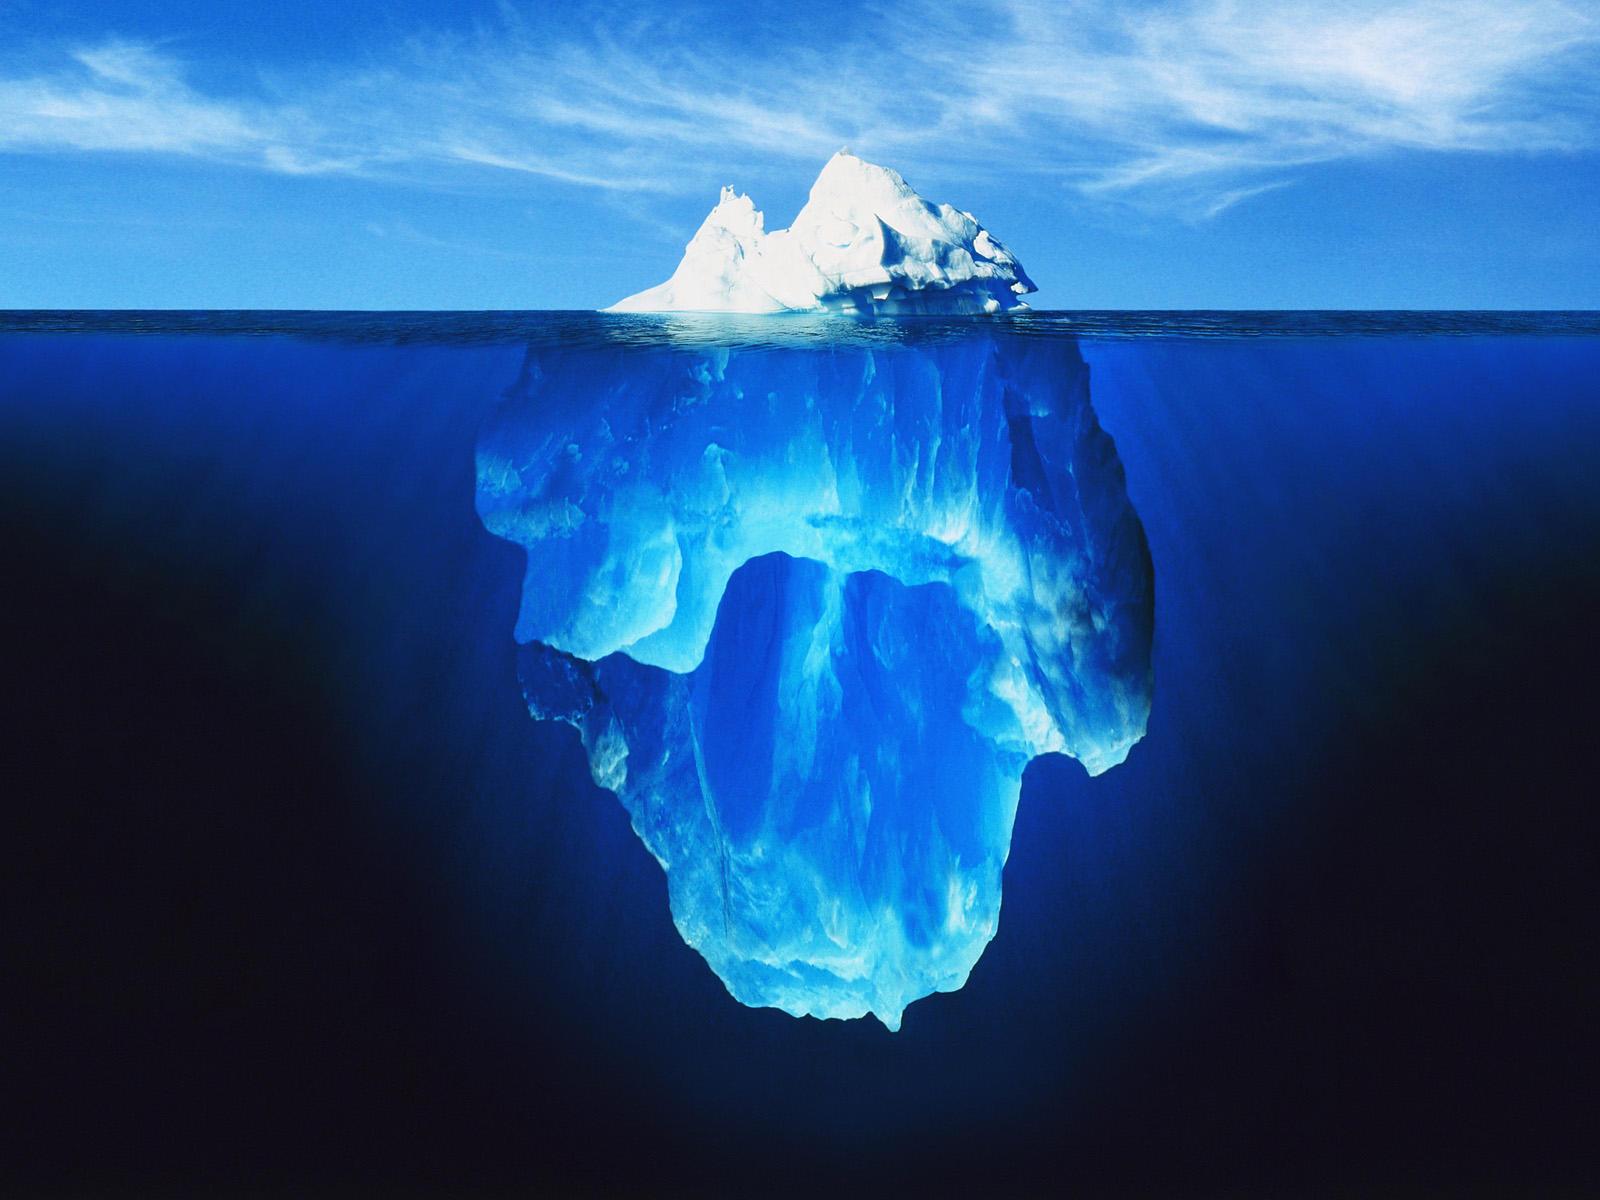 https://thewellhousecircle.files.wordpress.com/2013/03/tip-of-the-iceberg1.jpg